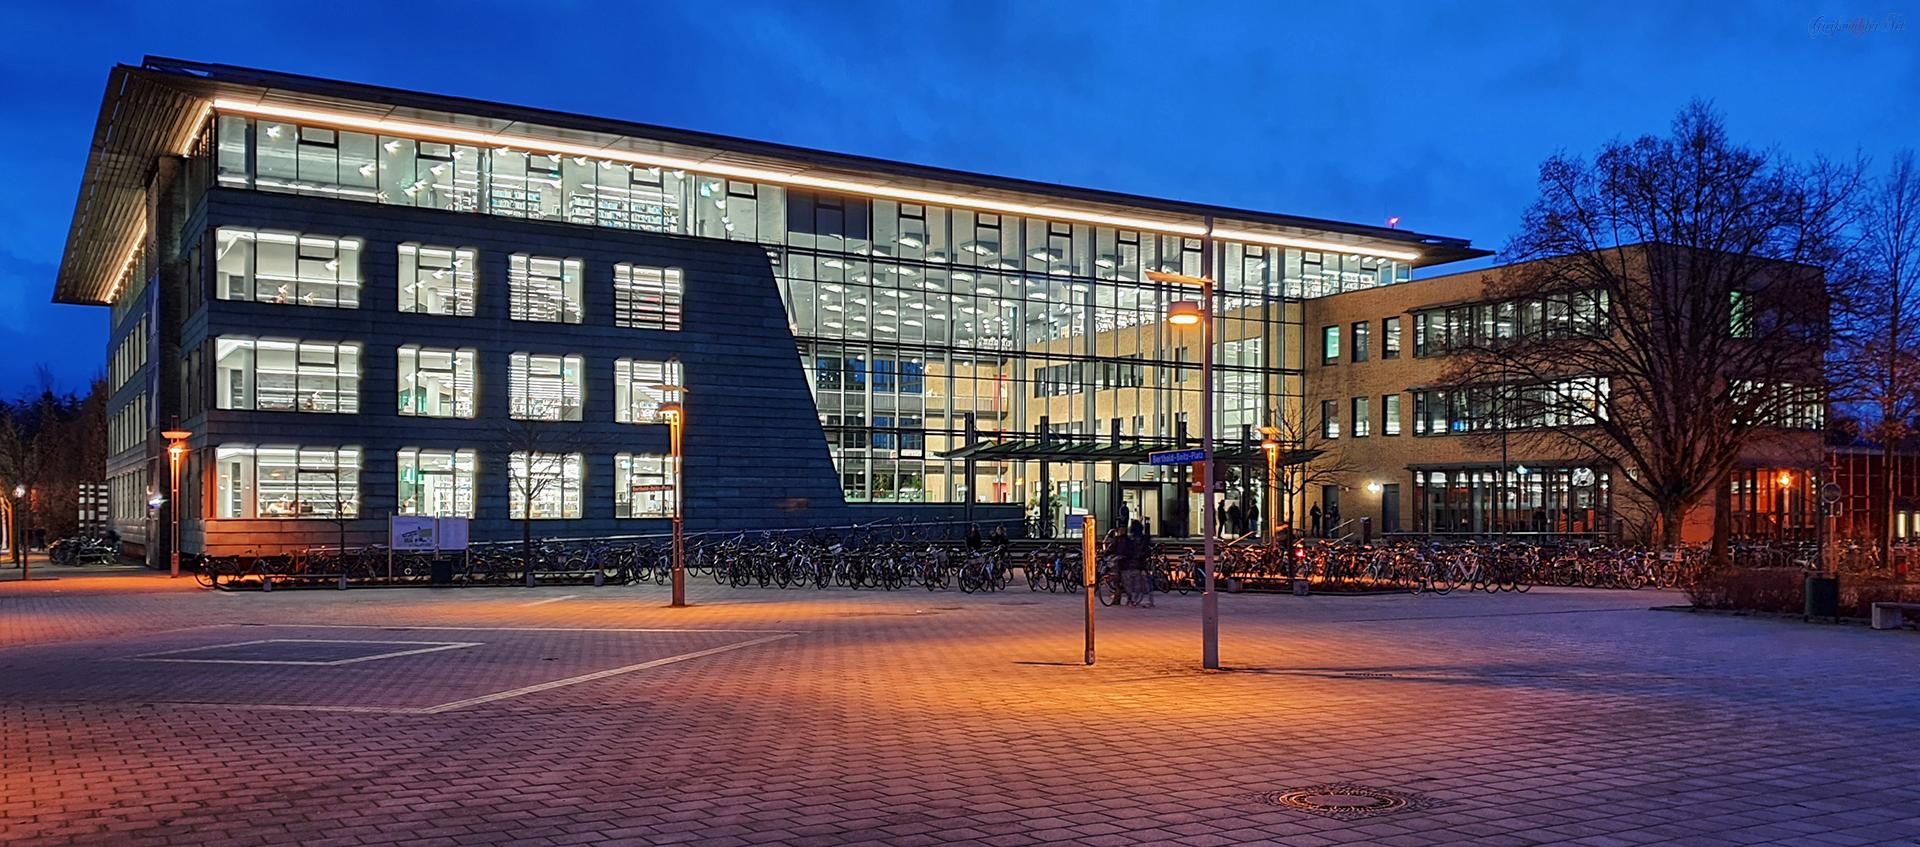 Universitätsbibliothek Greifswald am Berthold-Beitz-Platz